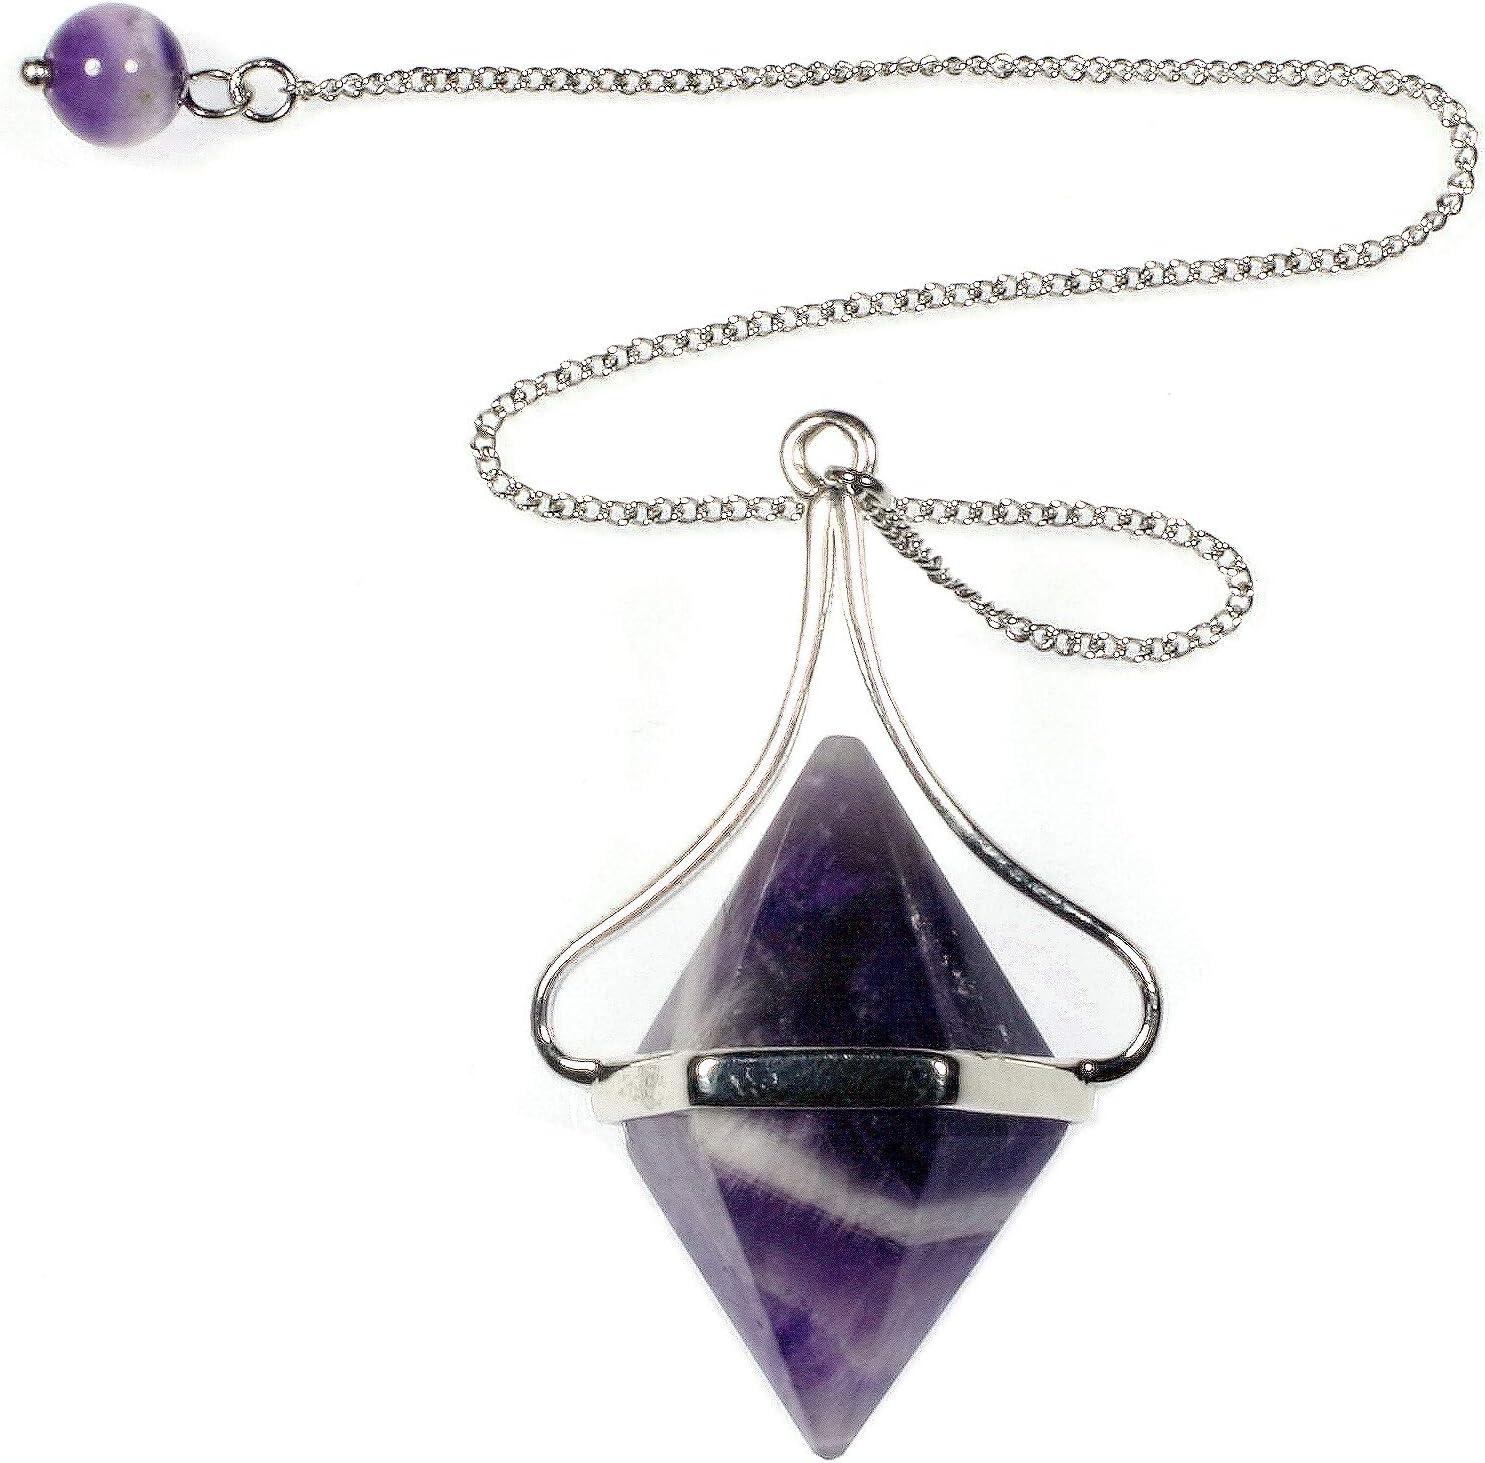 Gemstone Jewellery Chakra Pendant Necklace Crystal Point Healing Necklace Amethyst Pendulum Chevron Amethyst Necklace